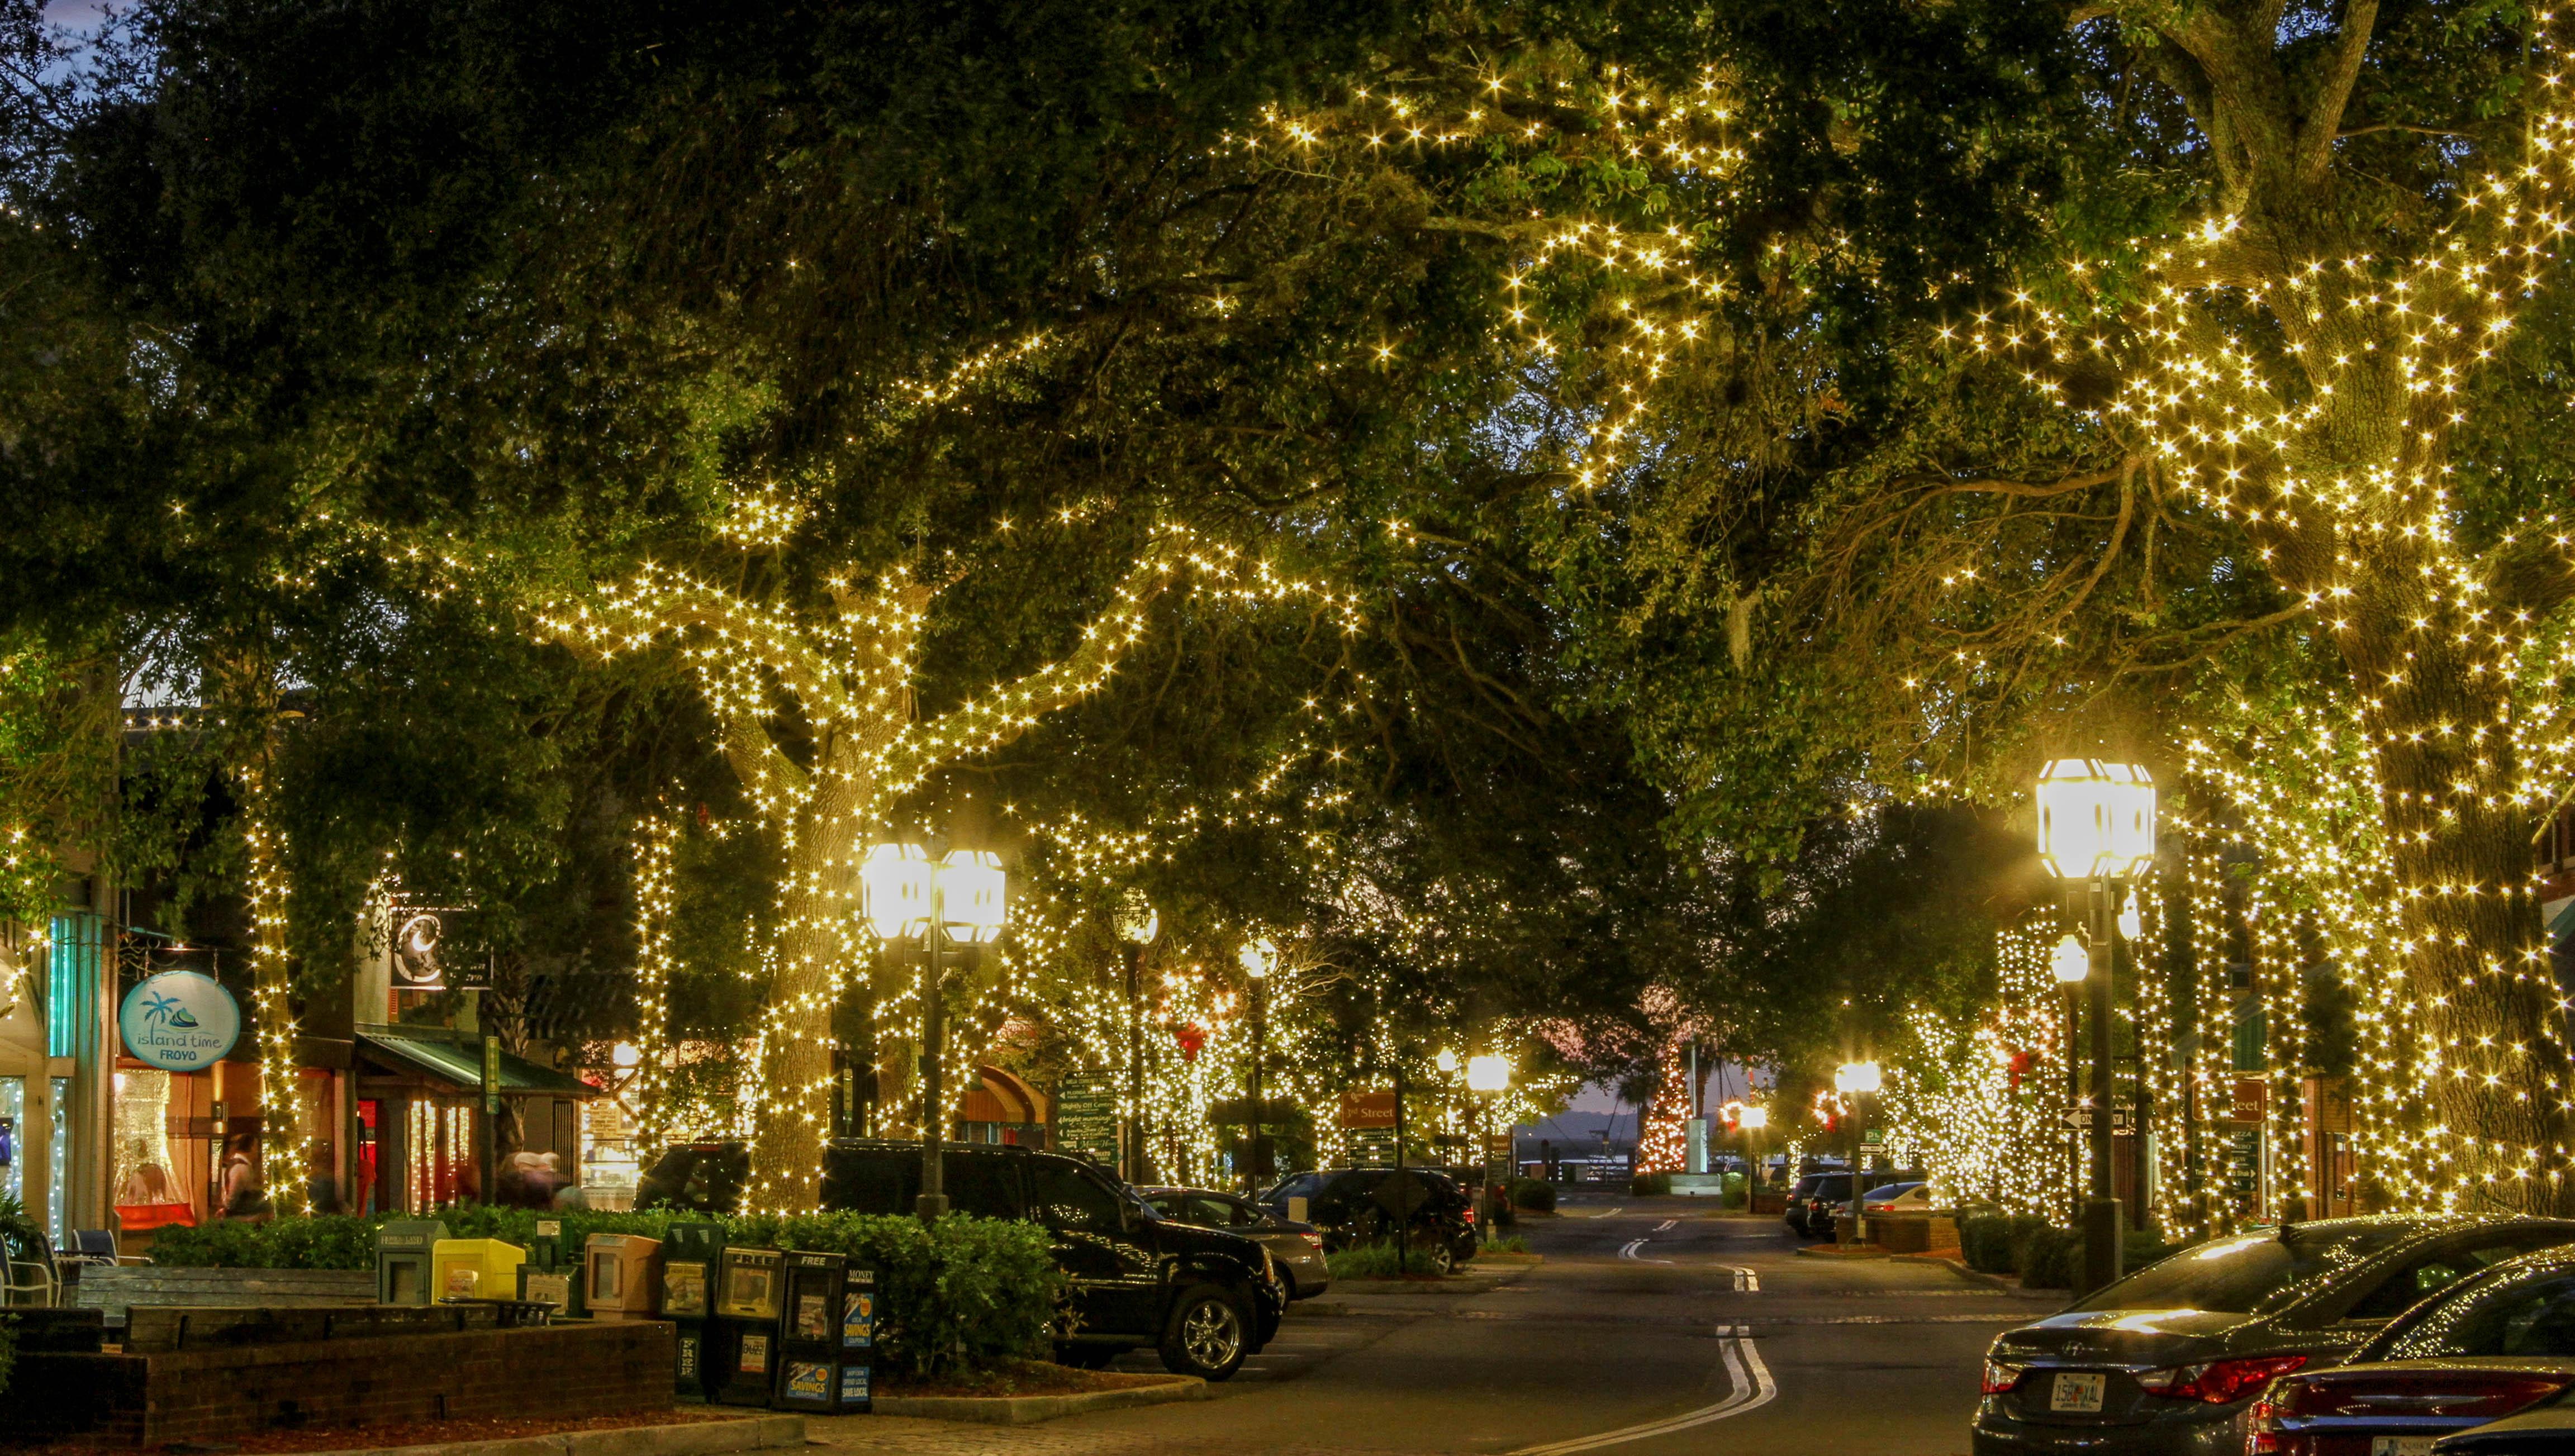 Christmas On Amelia Island 2020 Holiday Blog   Trip Inspiration   Amelia Island, Florida